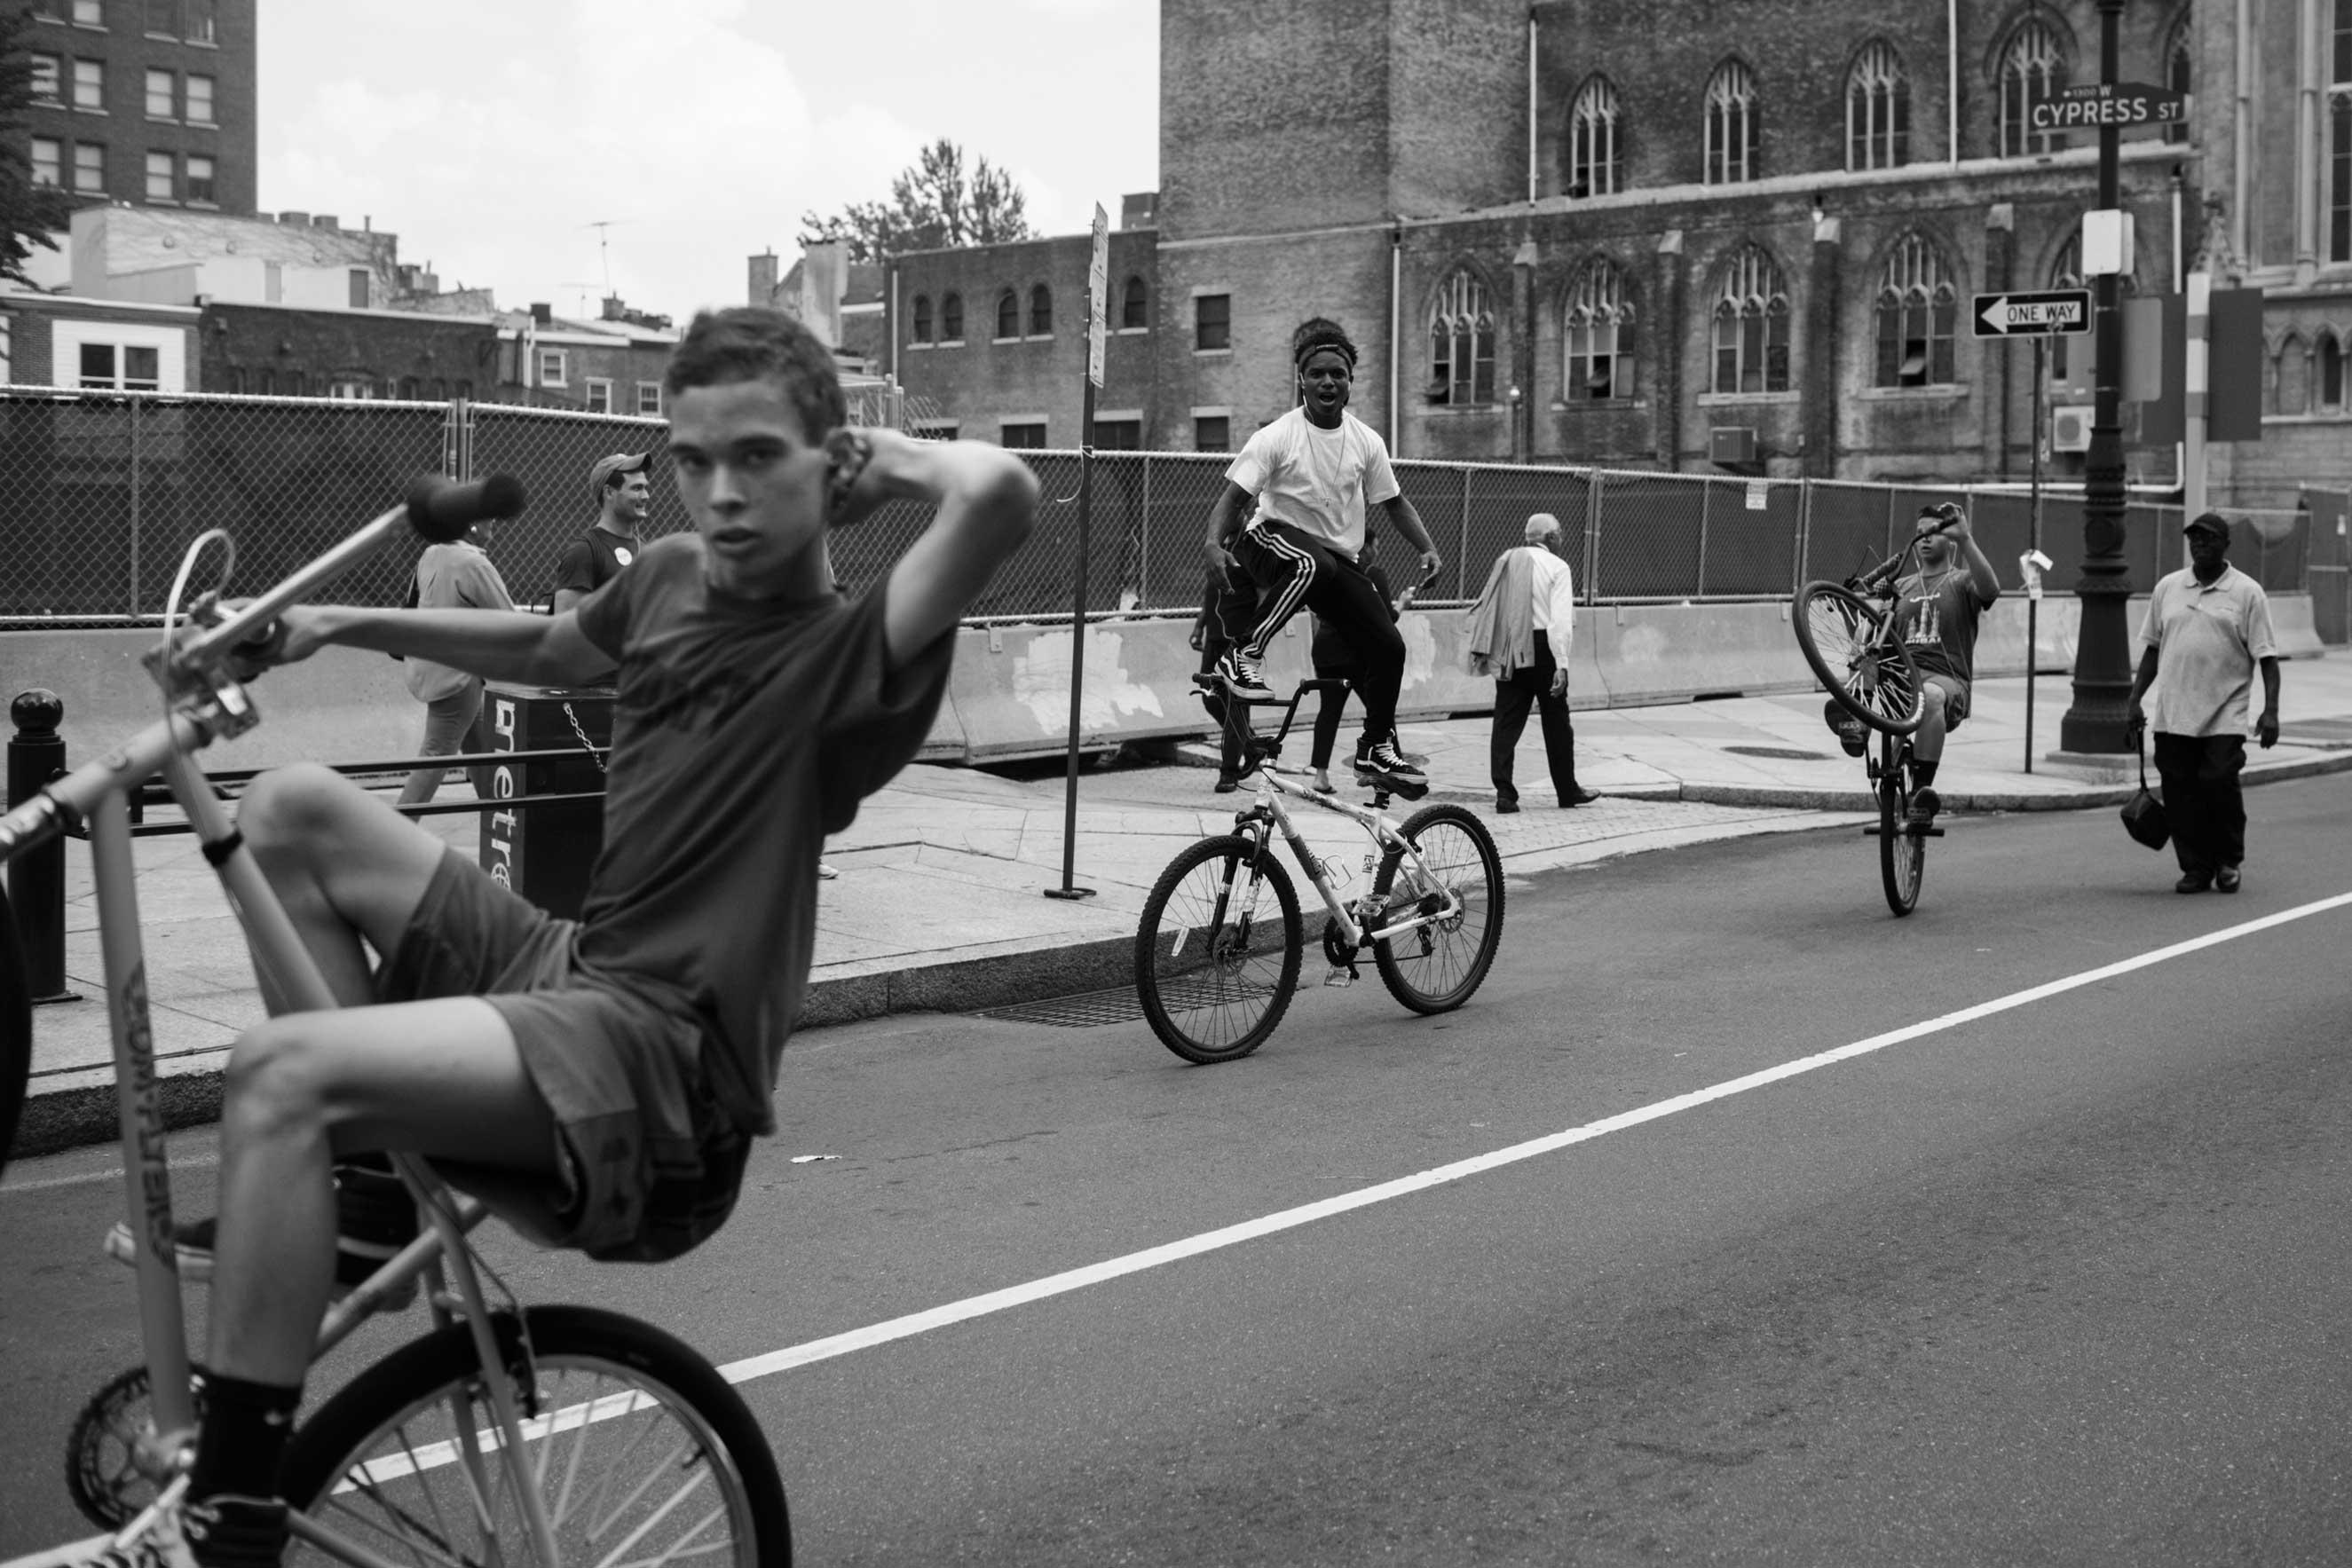 25 July 2016 - Philadelphia, PA - Teenagers are riding and doing tricks on their bikes through Downtown Philadelphia.